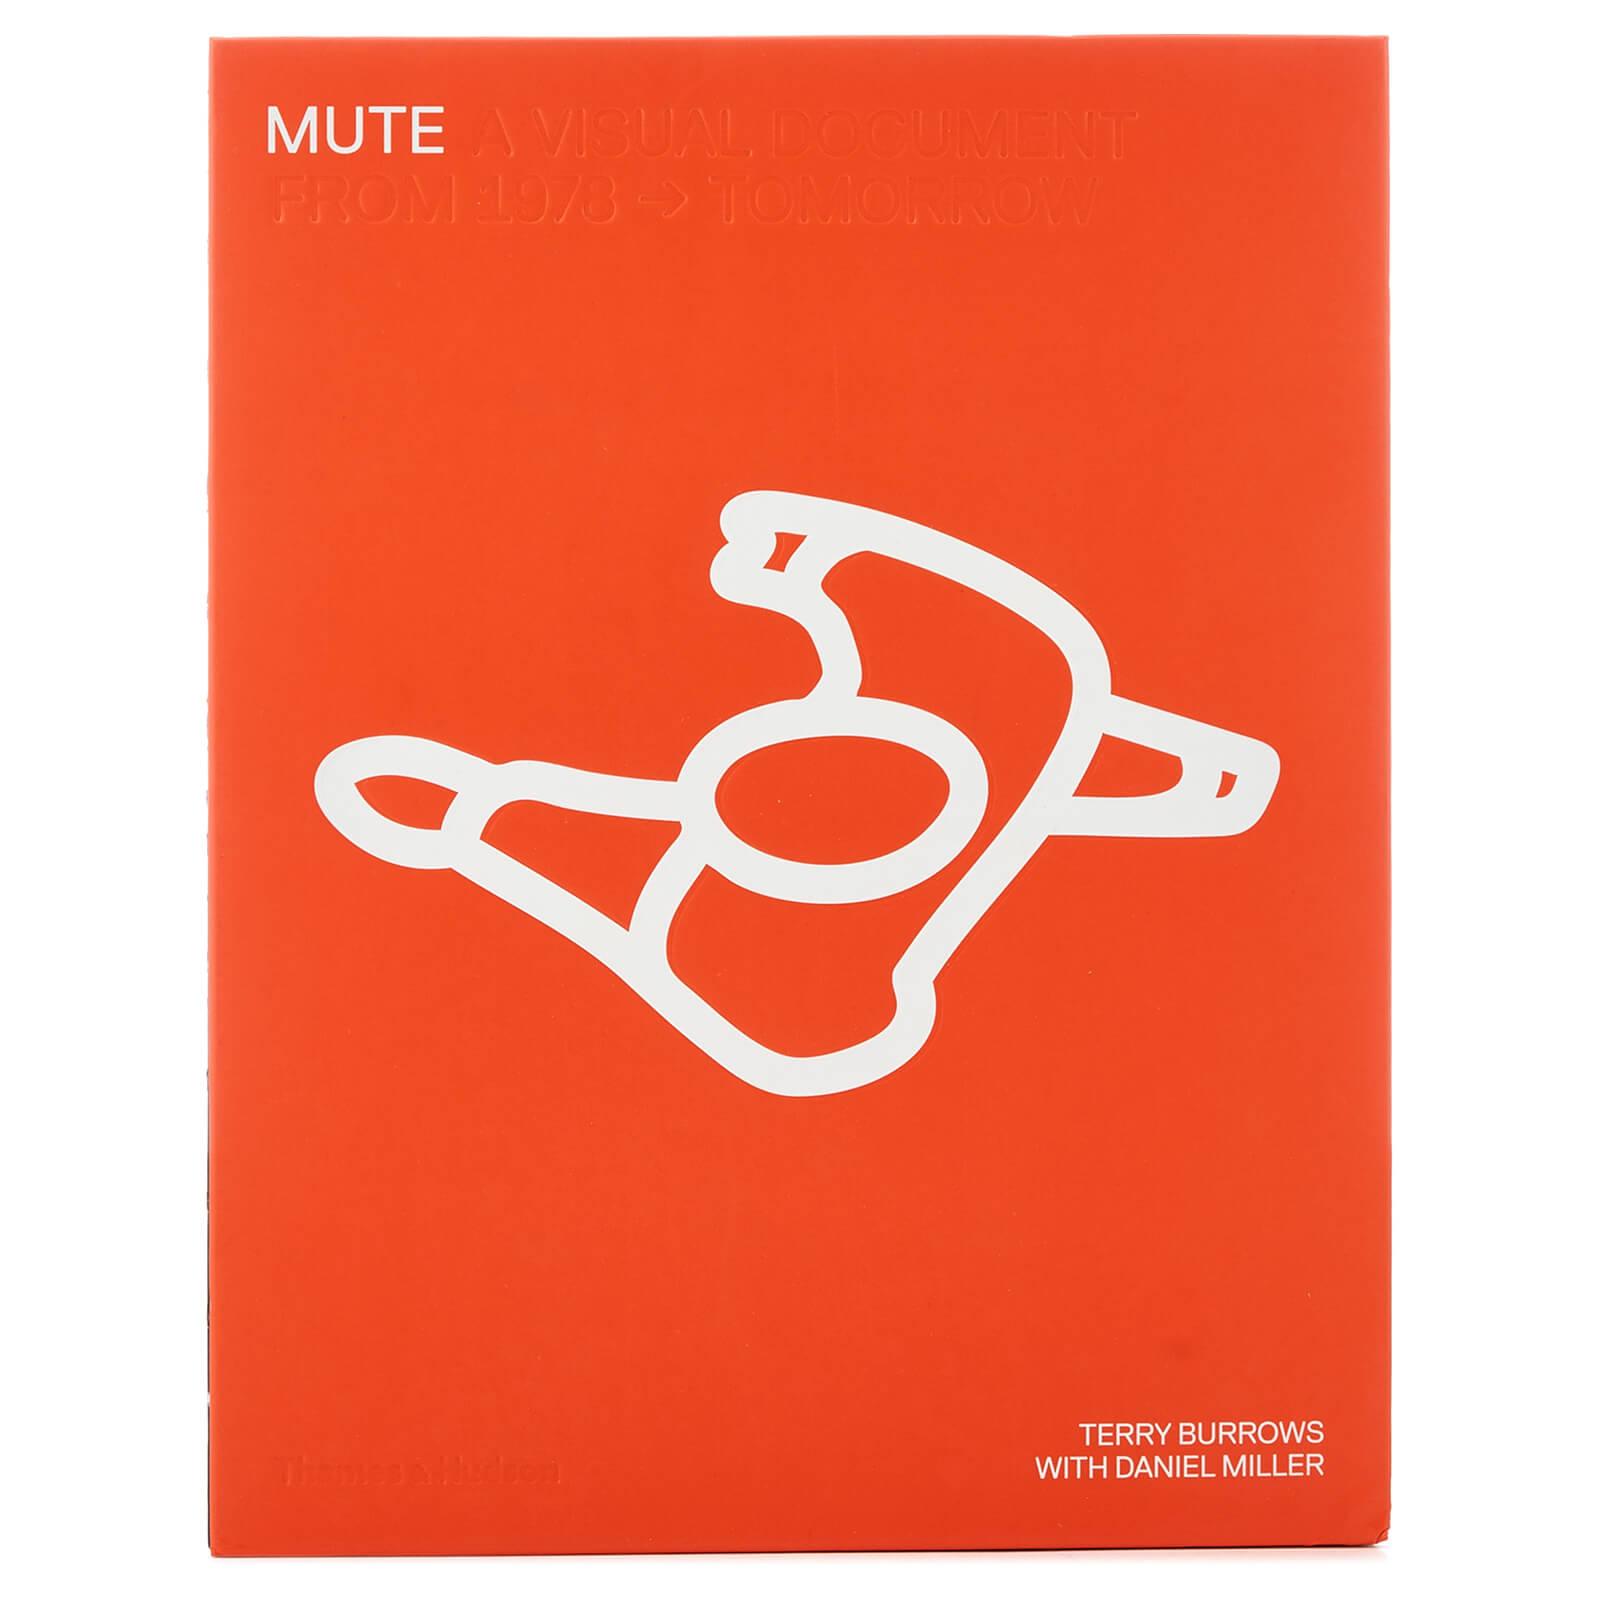 Thames and Hudson Ltd: Mute - A Visual Document